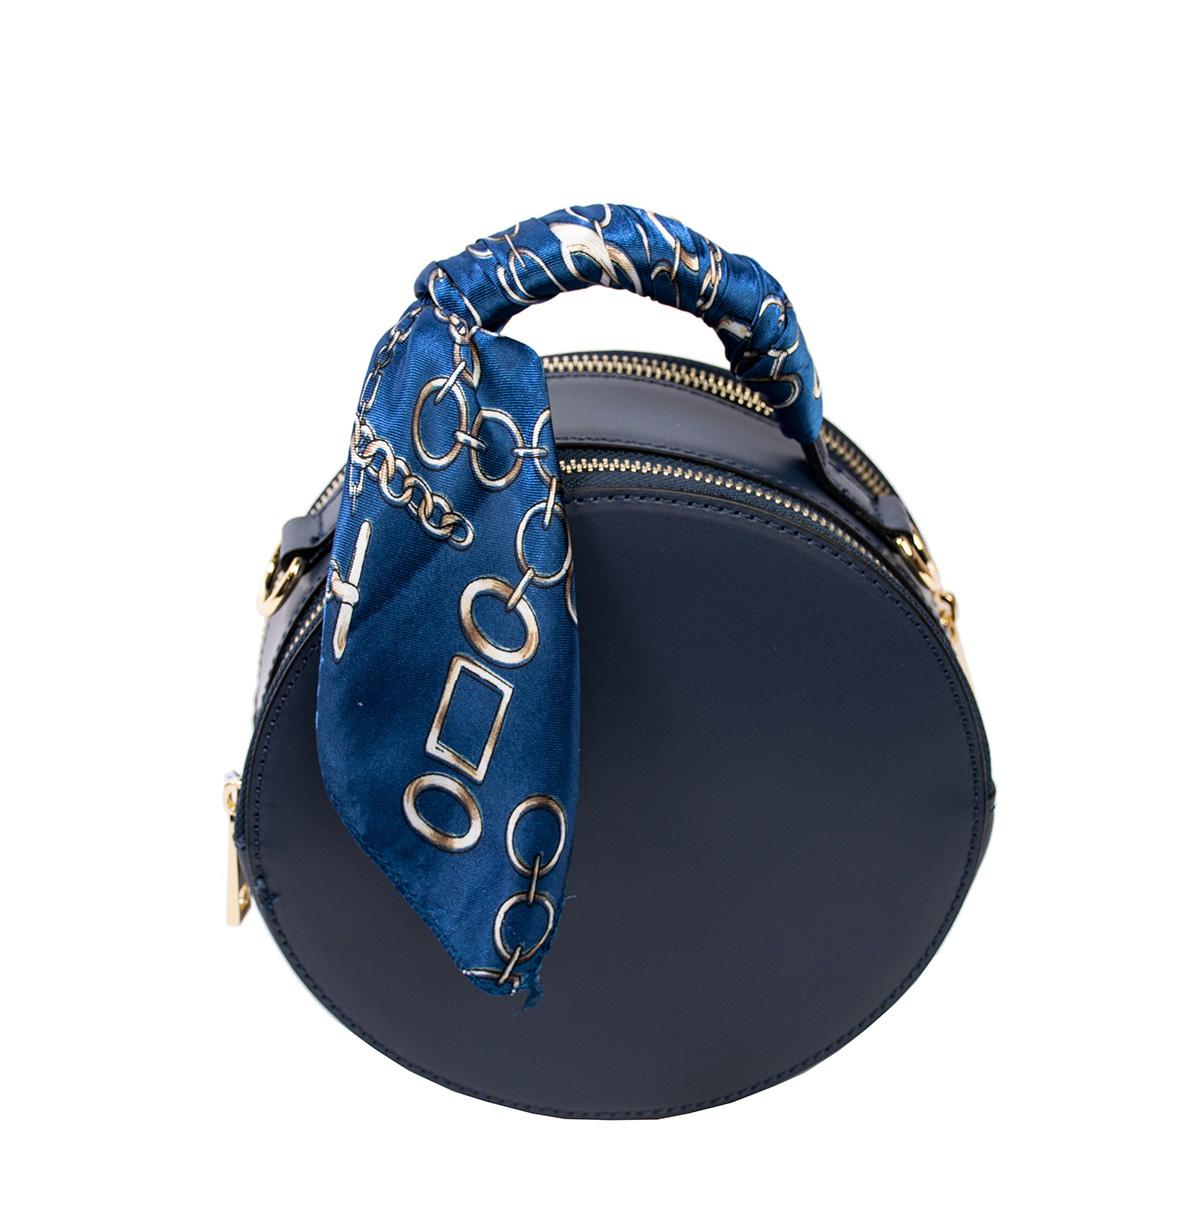 Bags and more Matilda Sötét kék Női Bőr Kézitáska